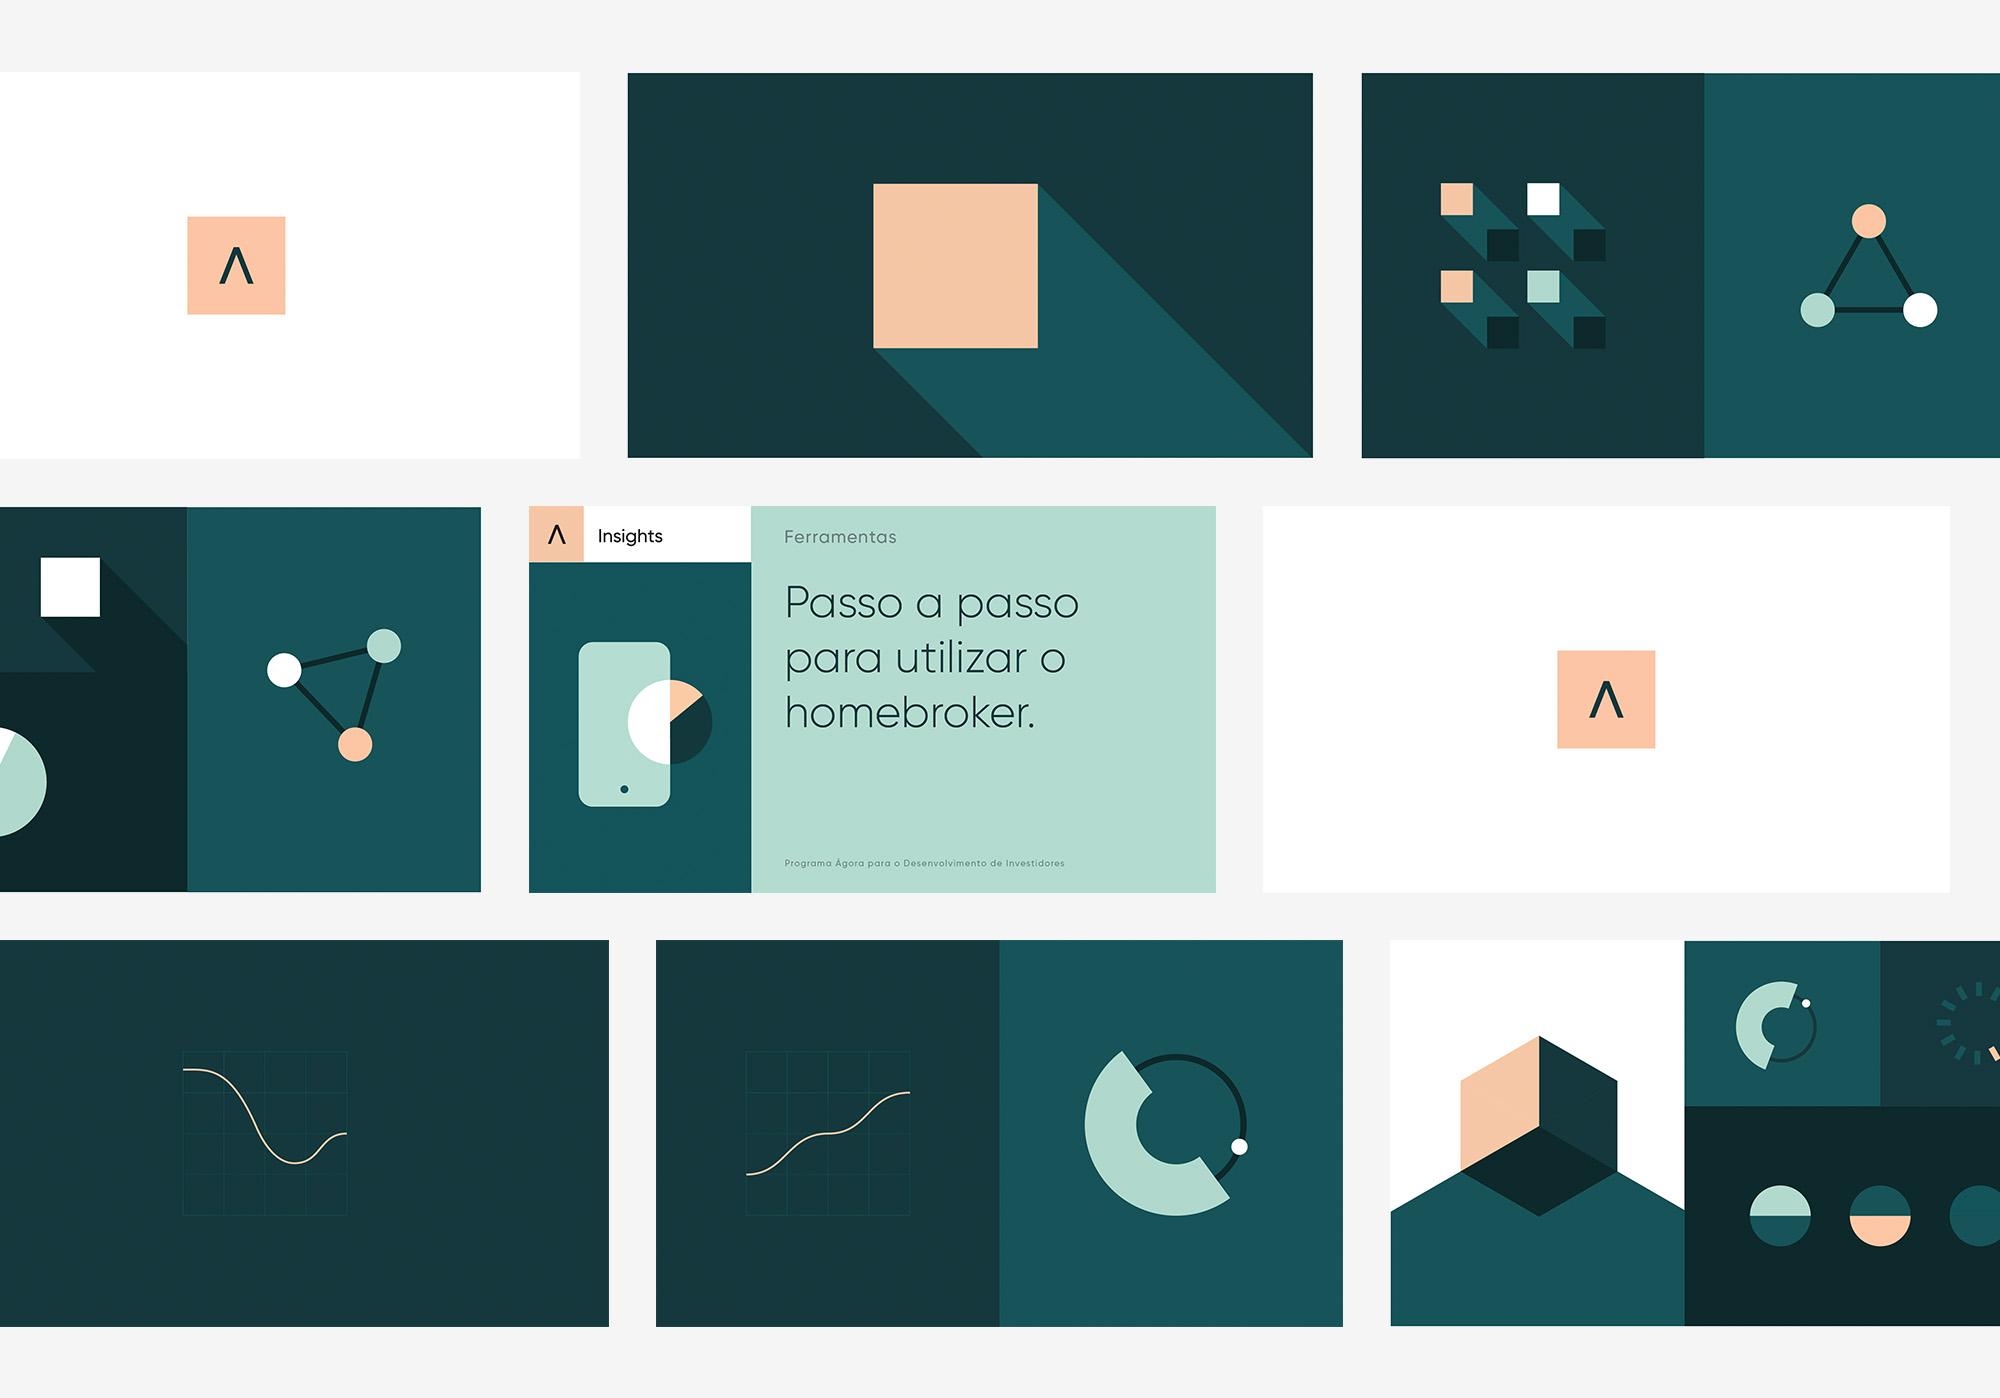 framework_agora_insights